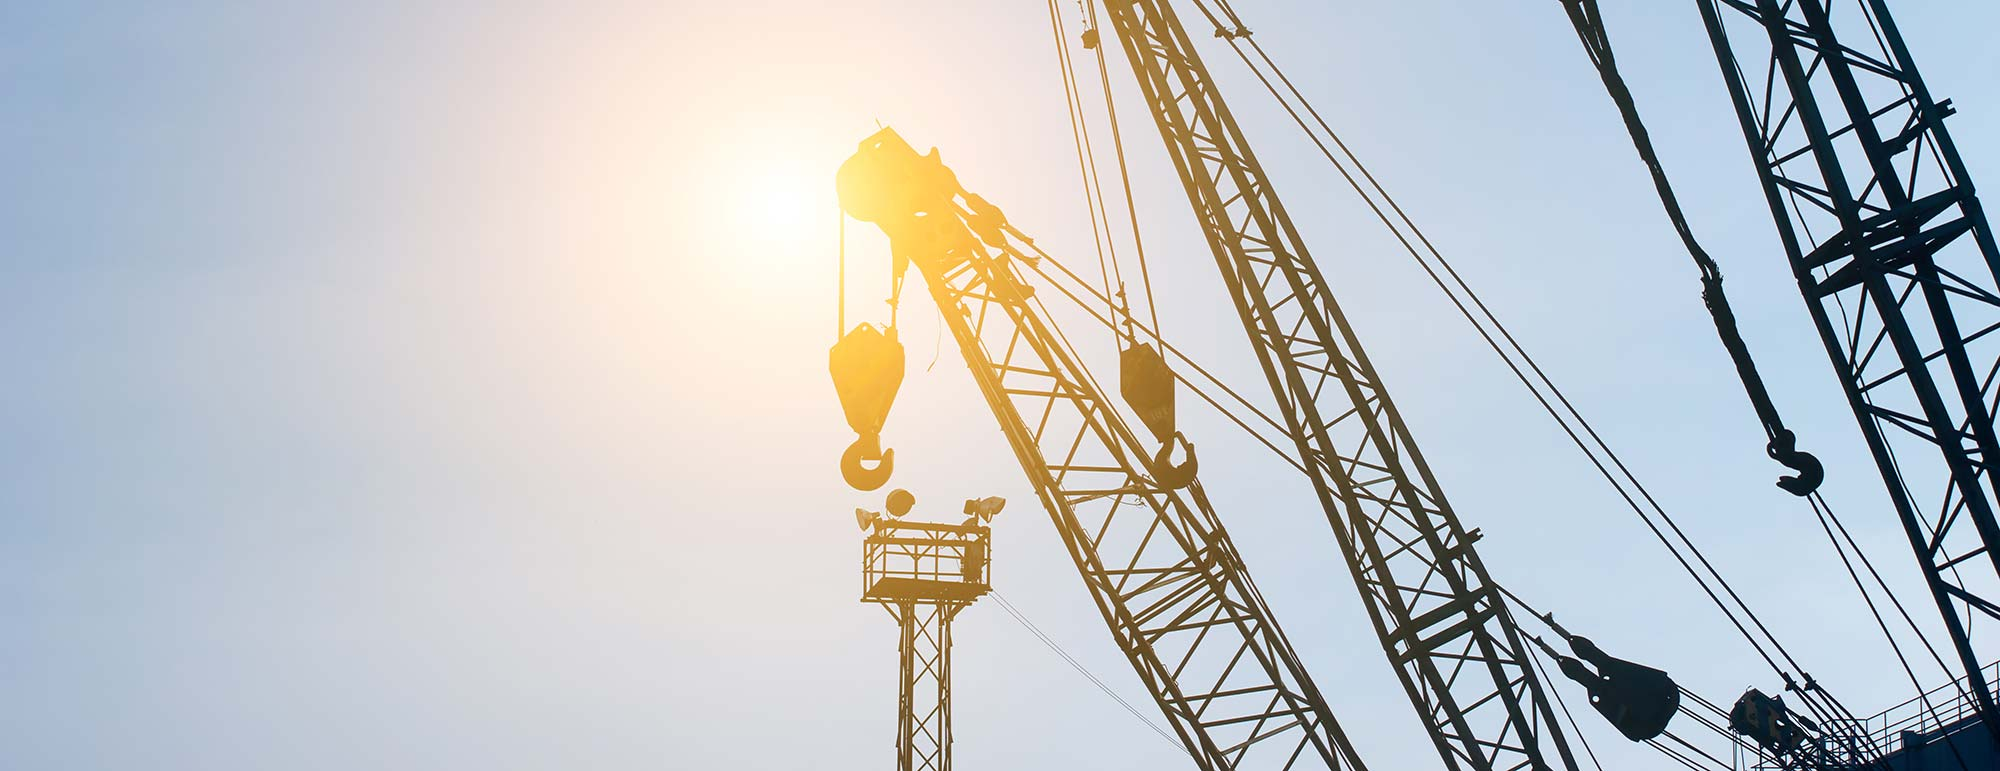 Ideal Crane